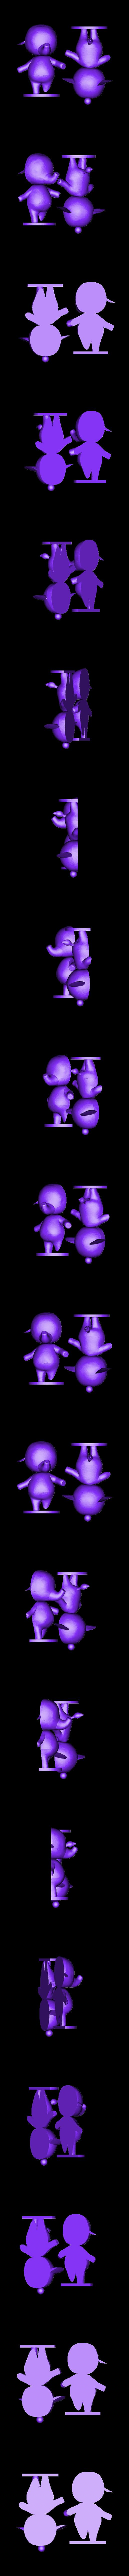 tia_split.stl Download free STL file Tia and Ellie - Animal Crossing • 3D printable model, skelei